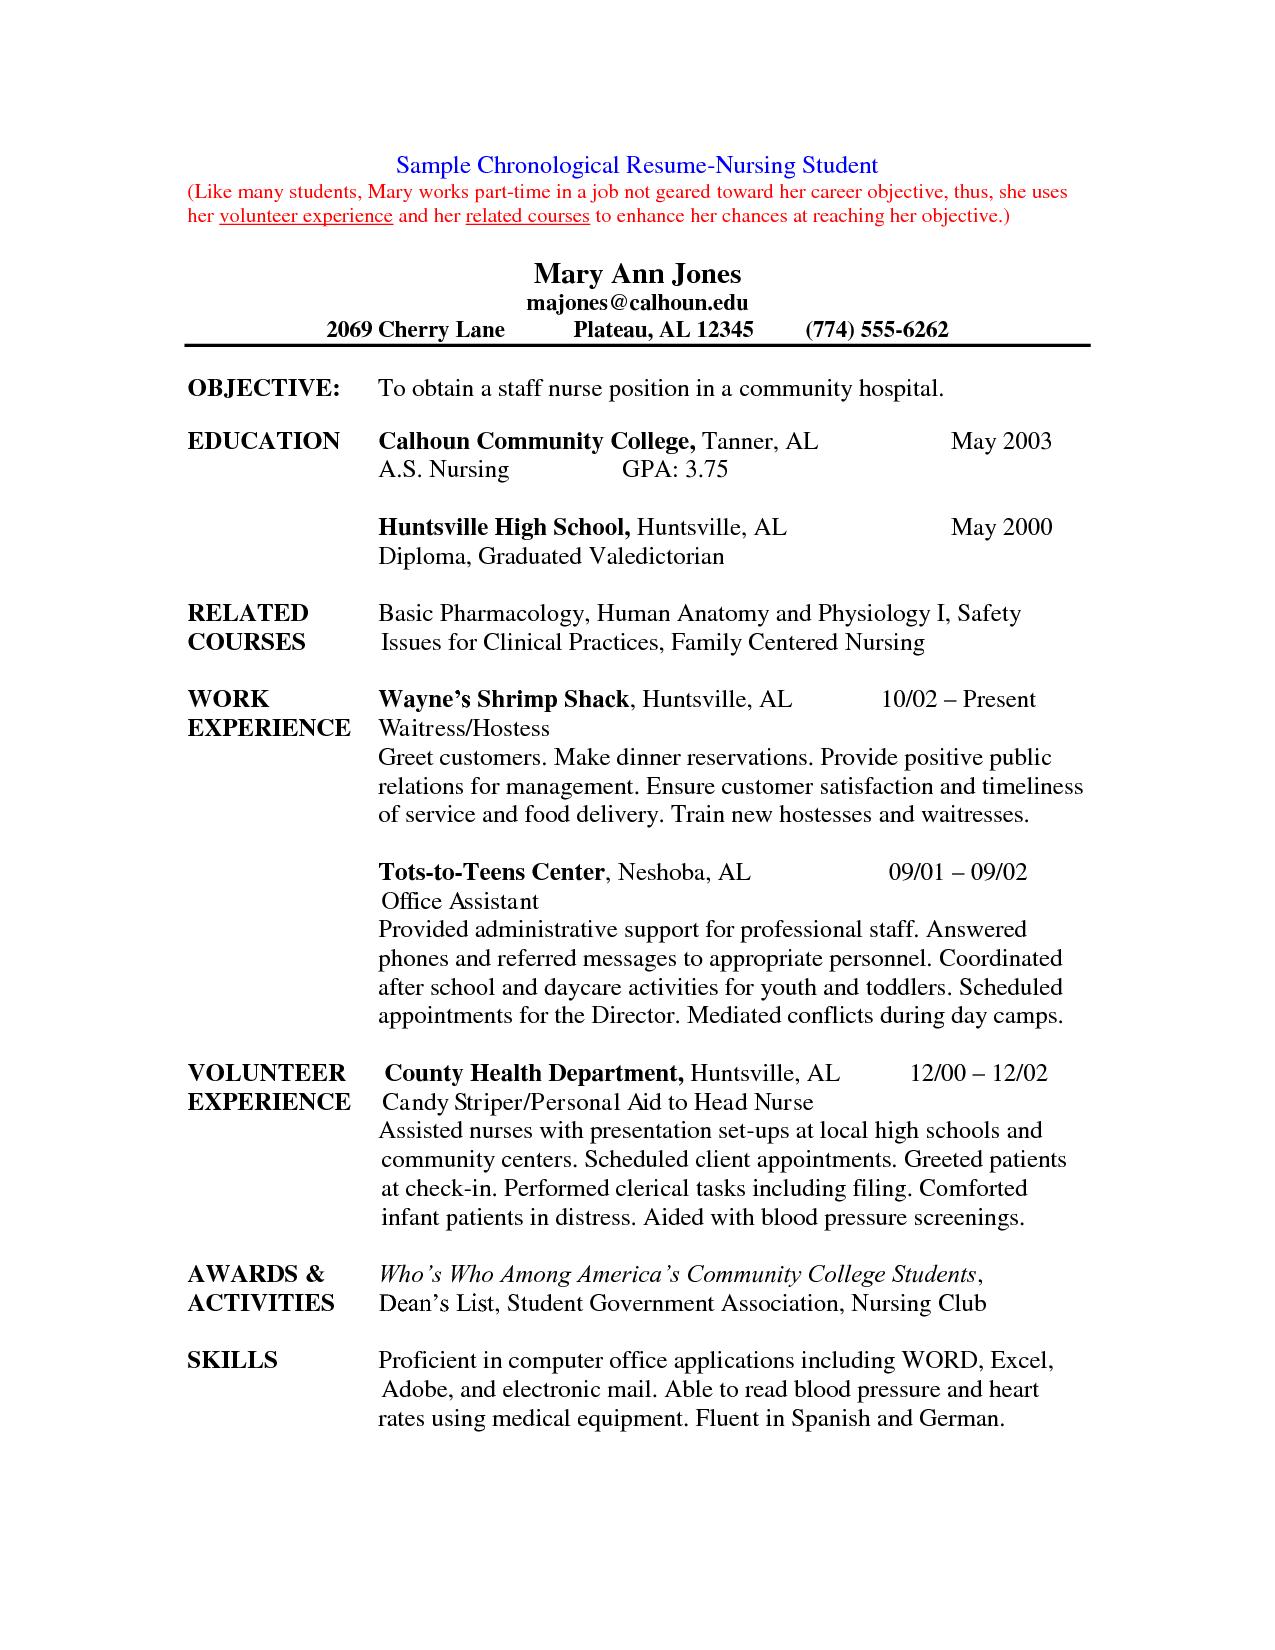 Cover Letters For Nursing Job Application Pdf Student Nurse Resume Nursing Resume Template Nursing Resume